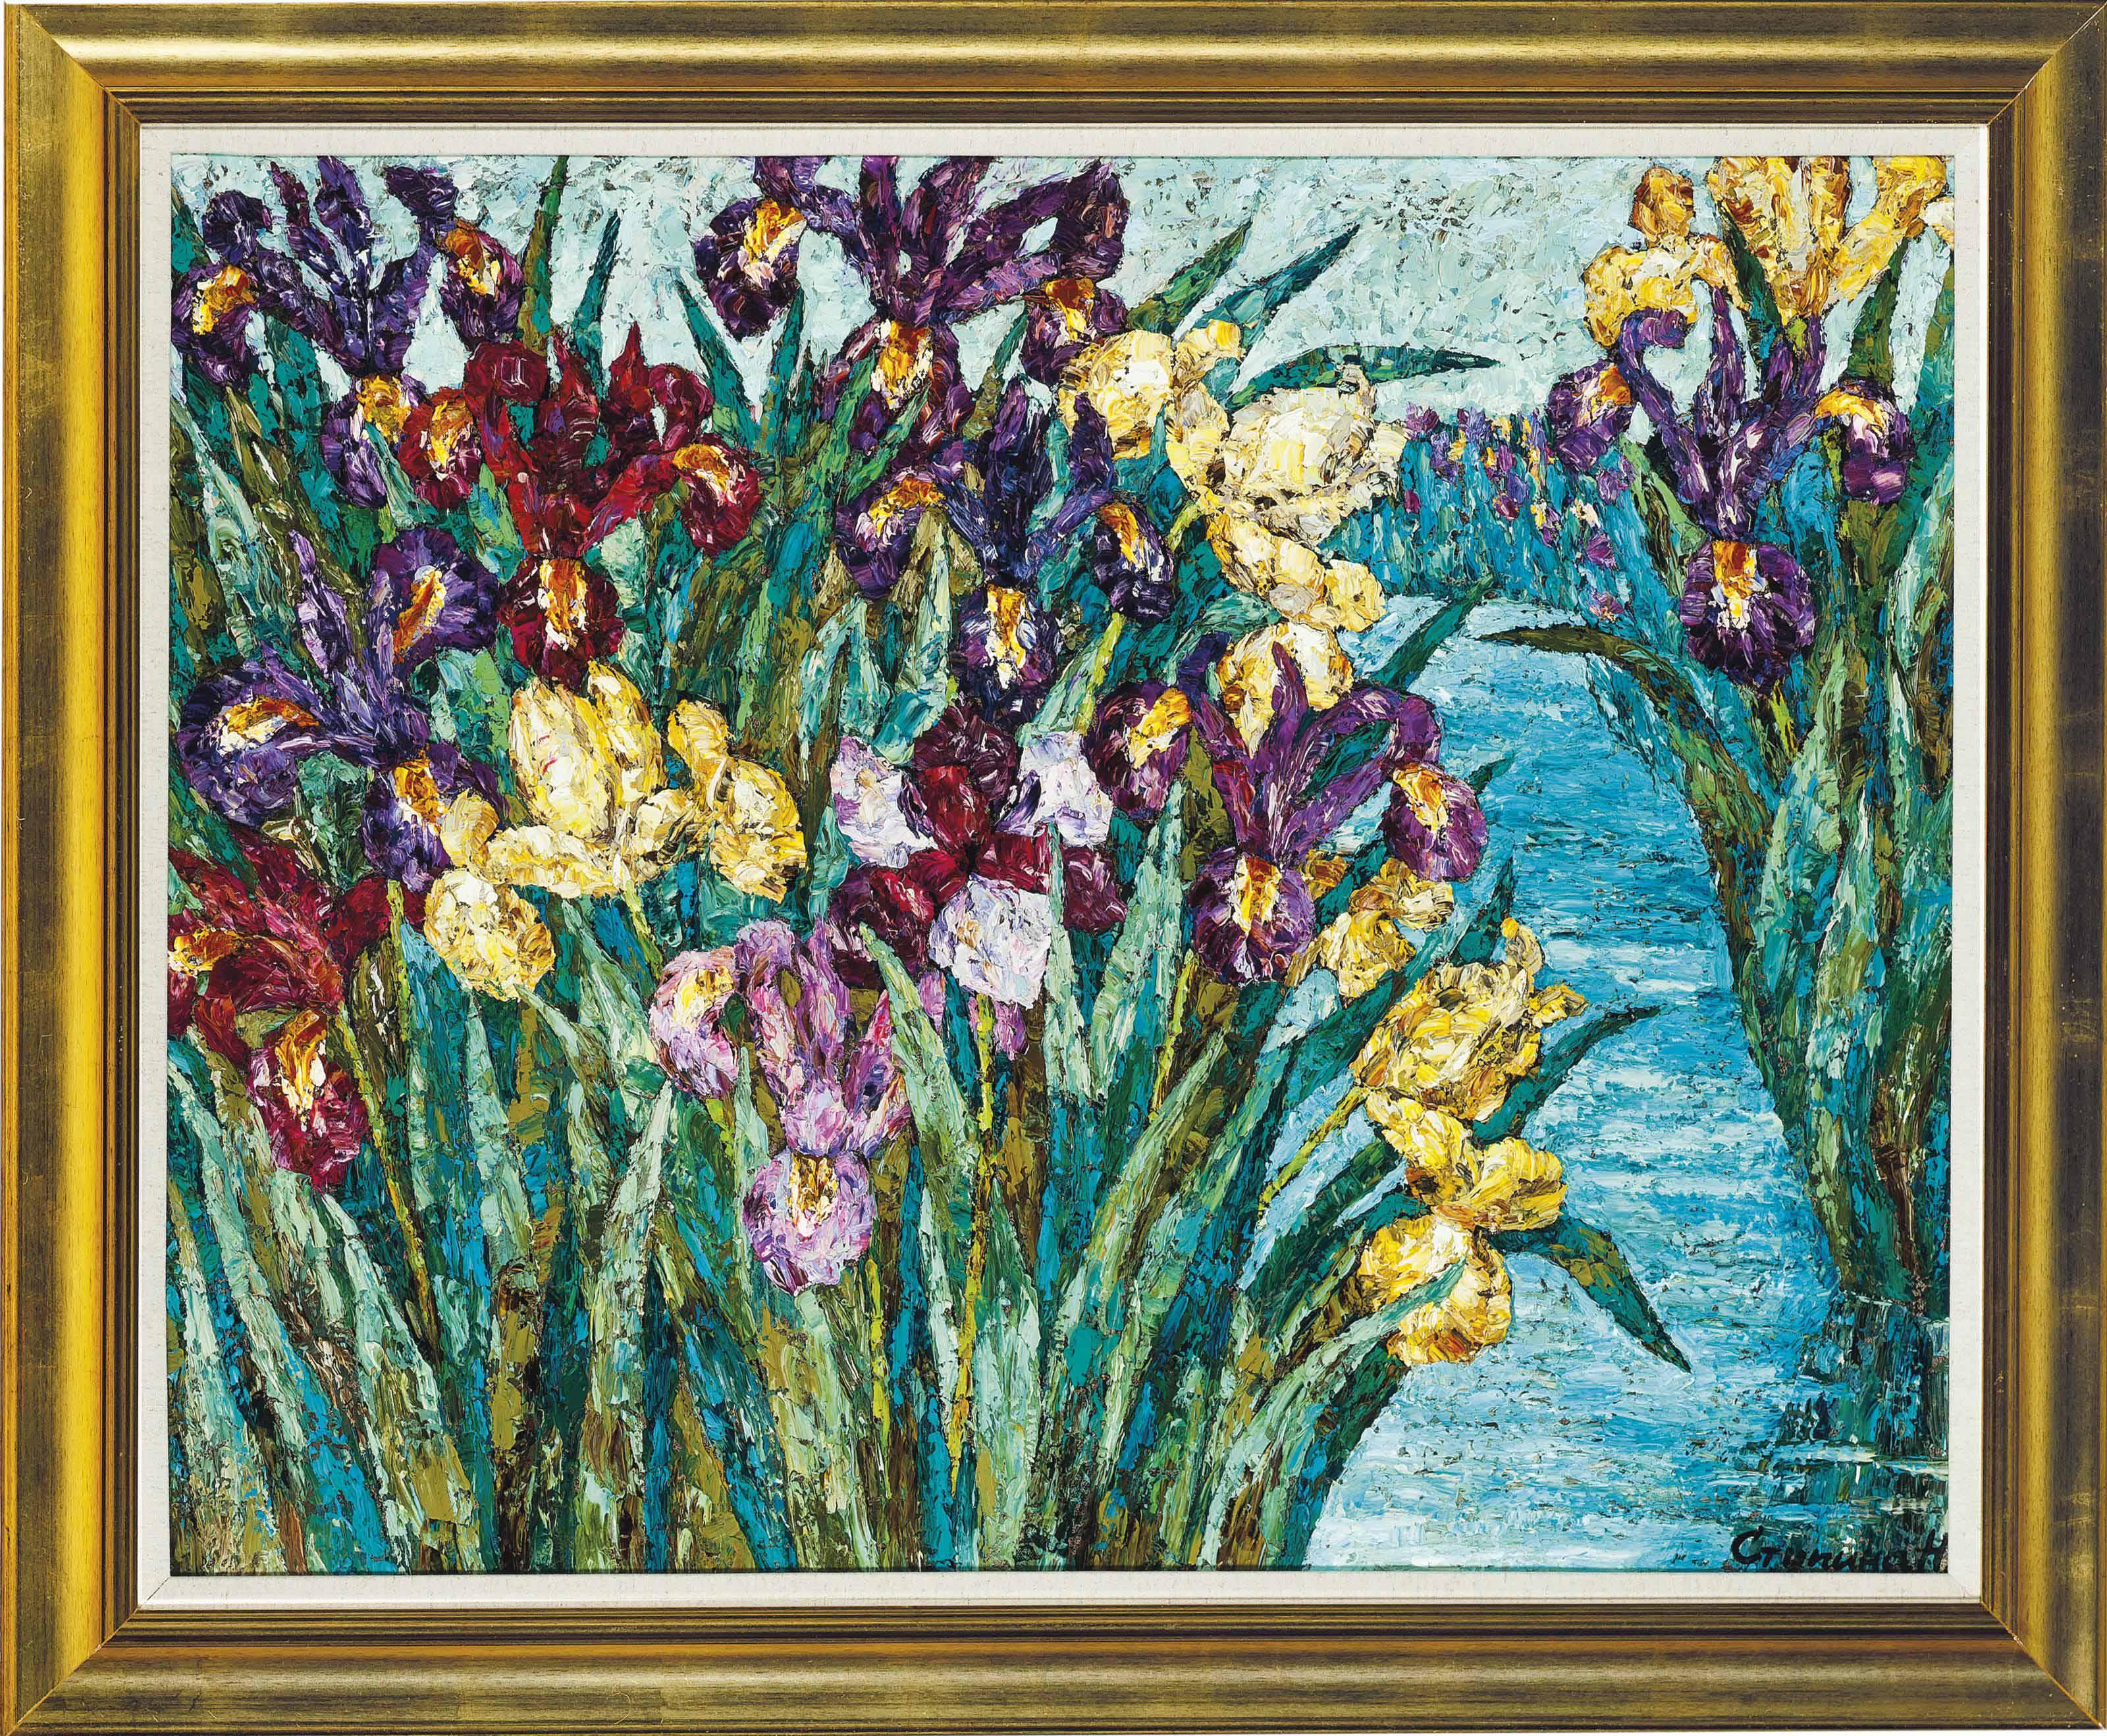 Iris by water